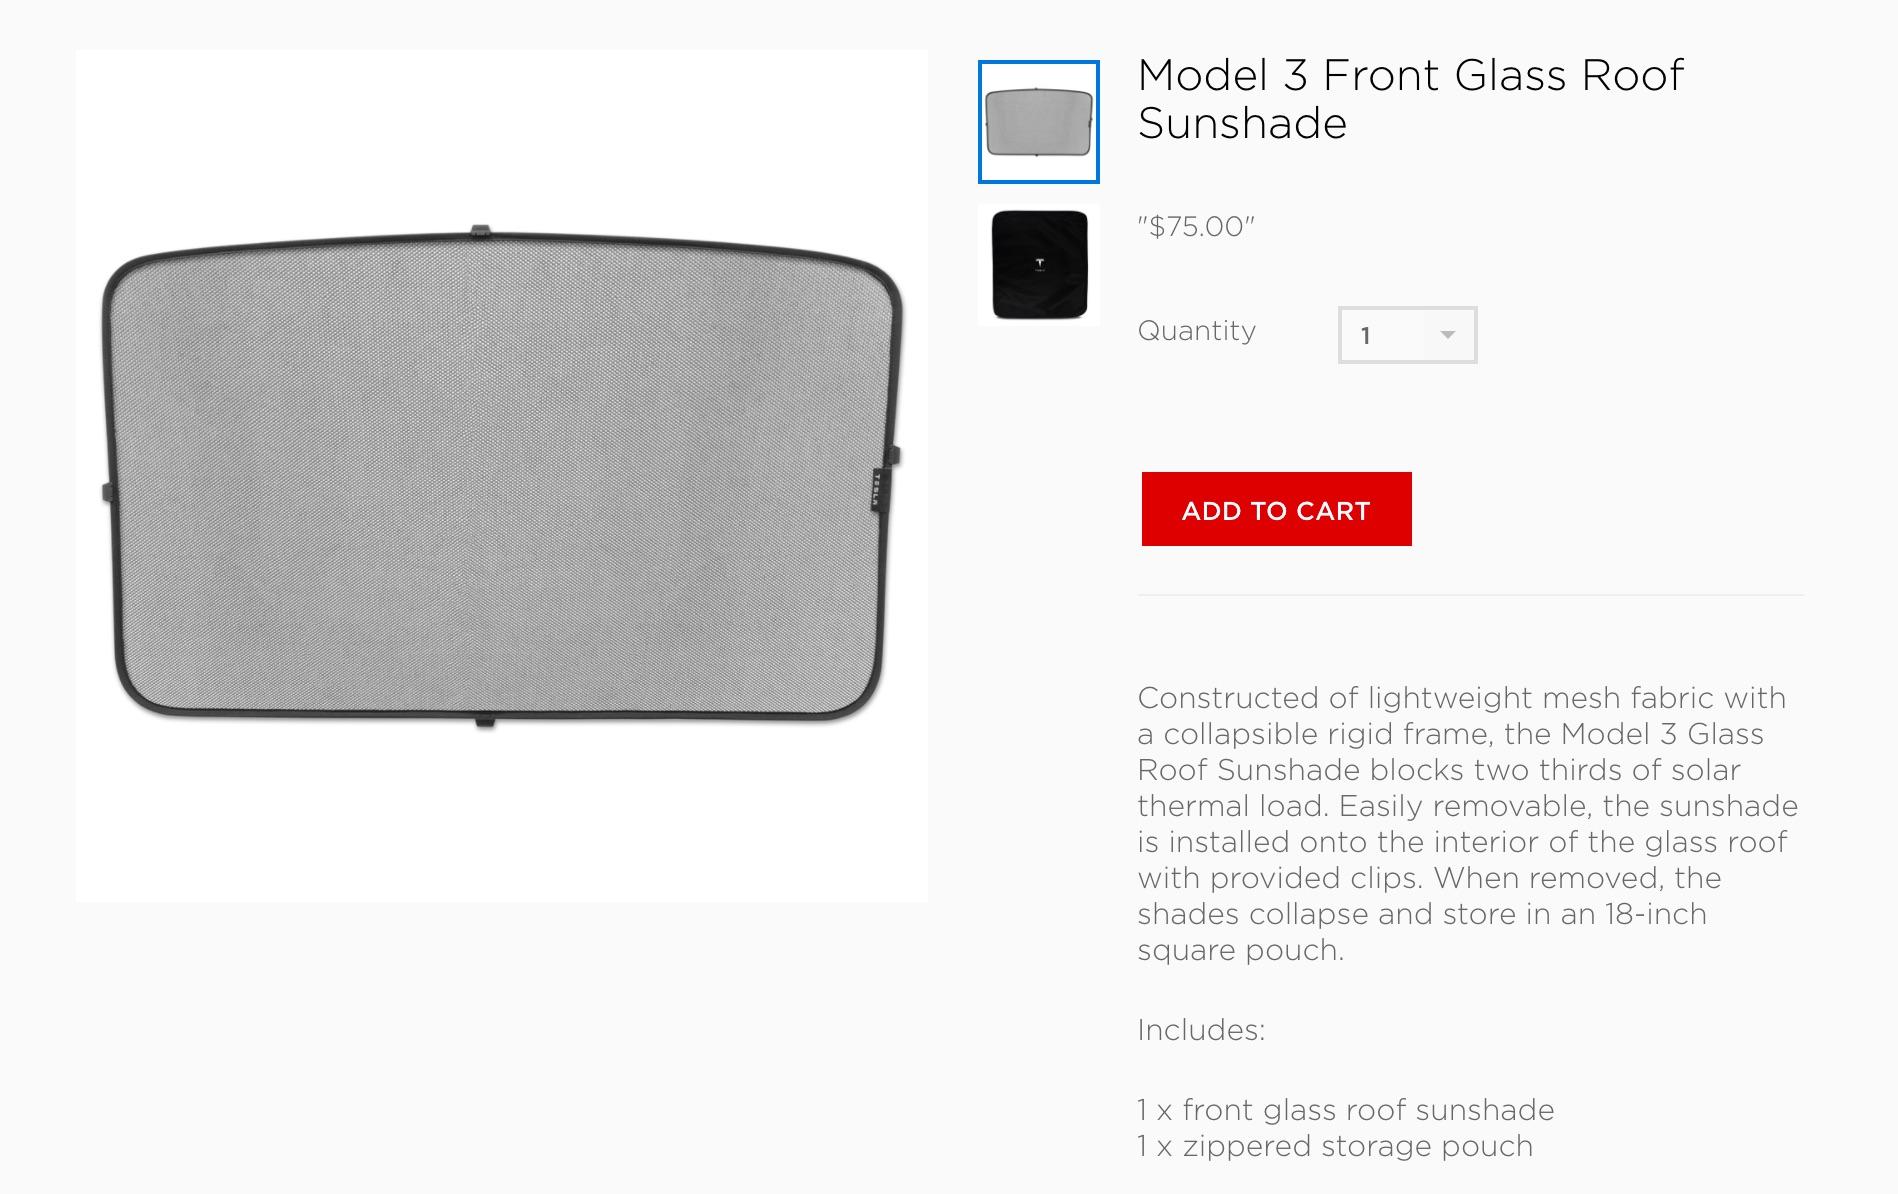 sunshade-model-3-glass-roof